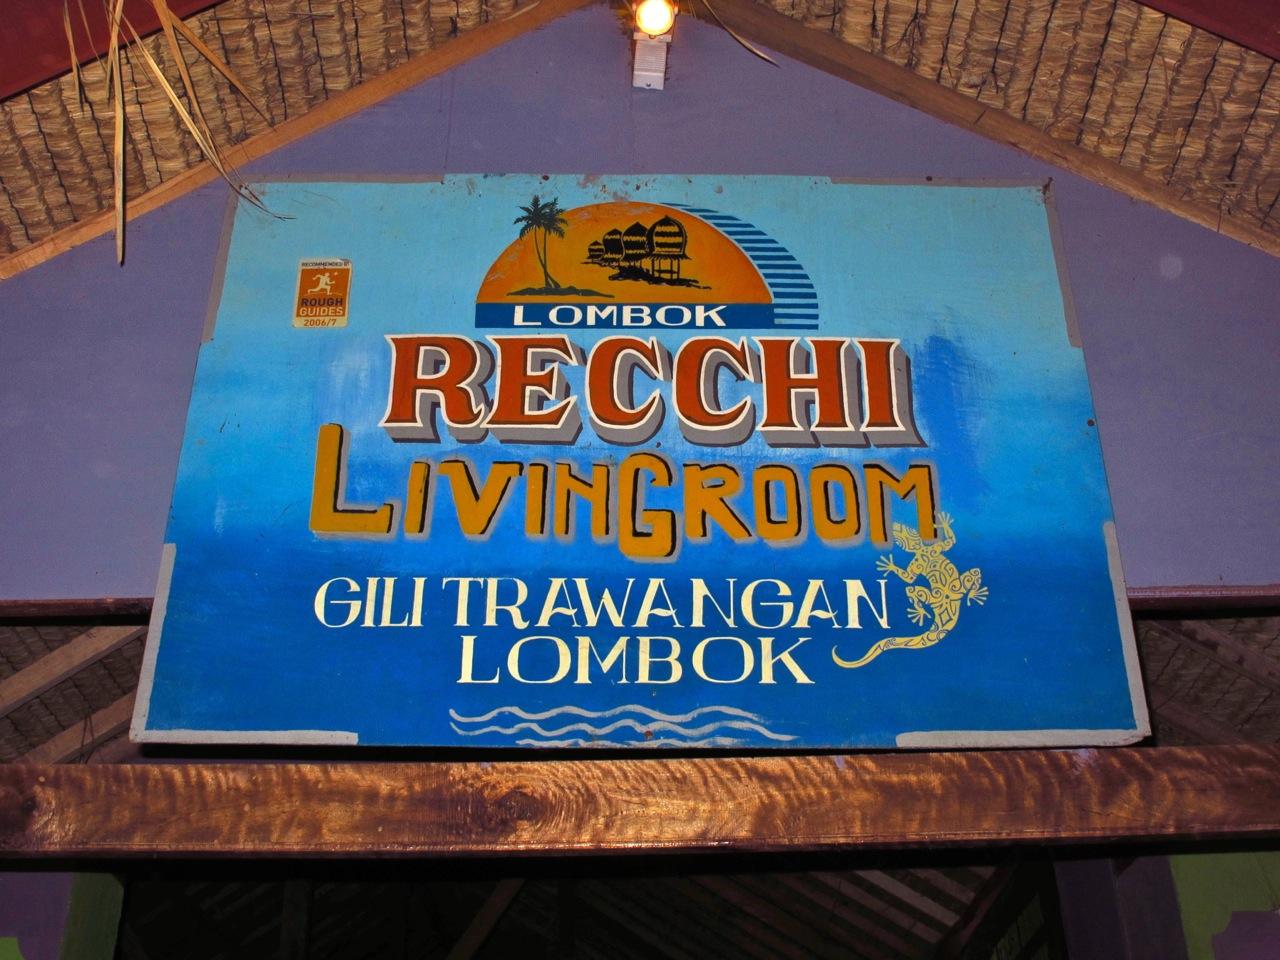 Recchi Living room Gili Trawangan